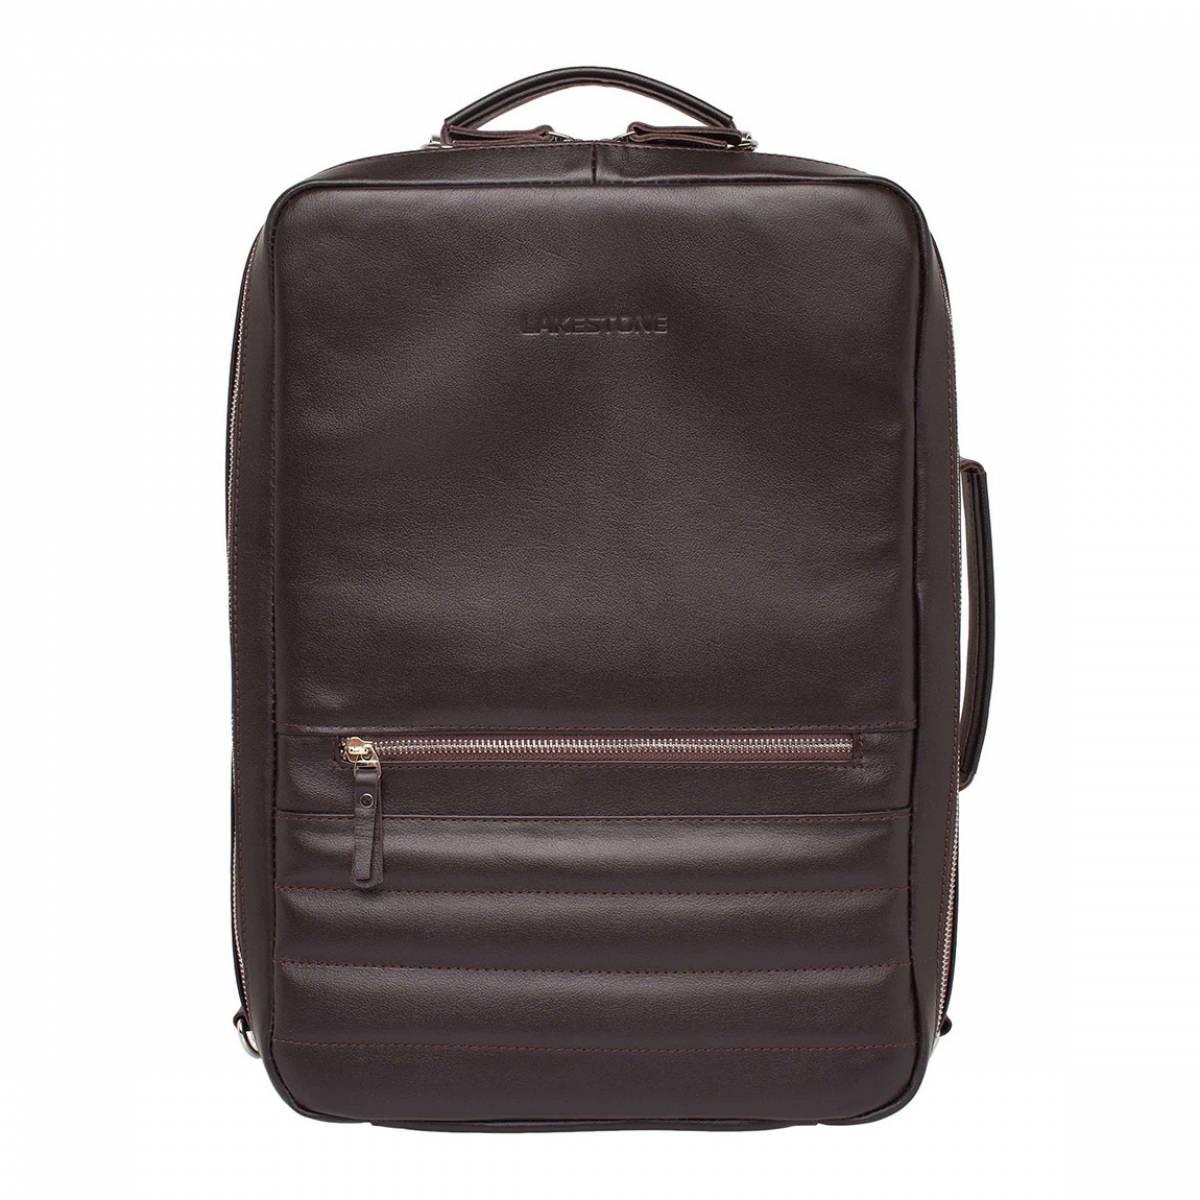 Рюкзак-трансформер Banister Brown